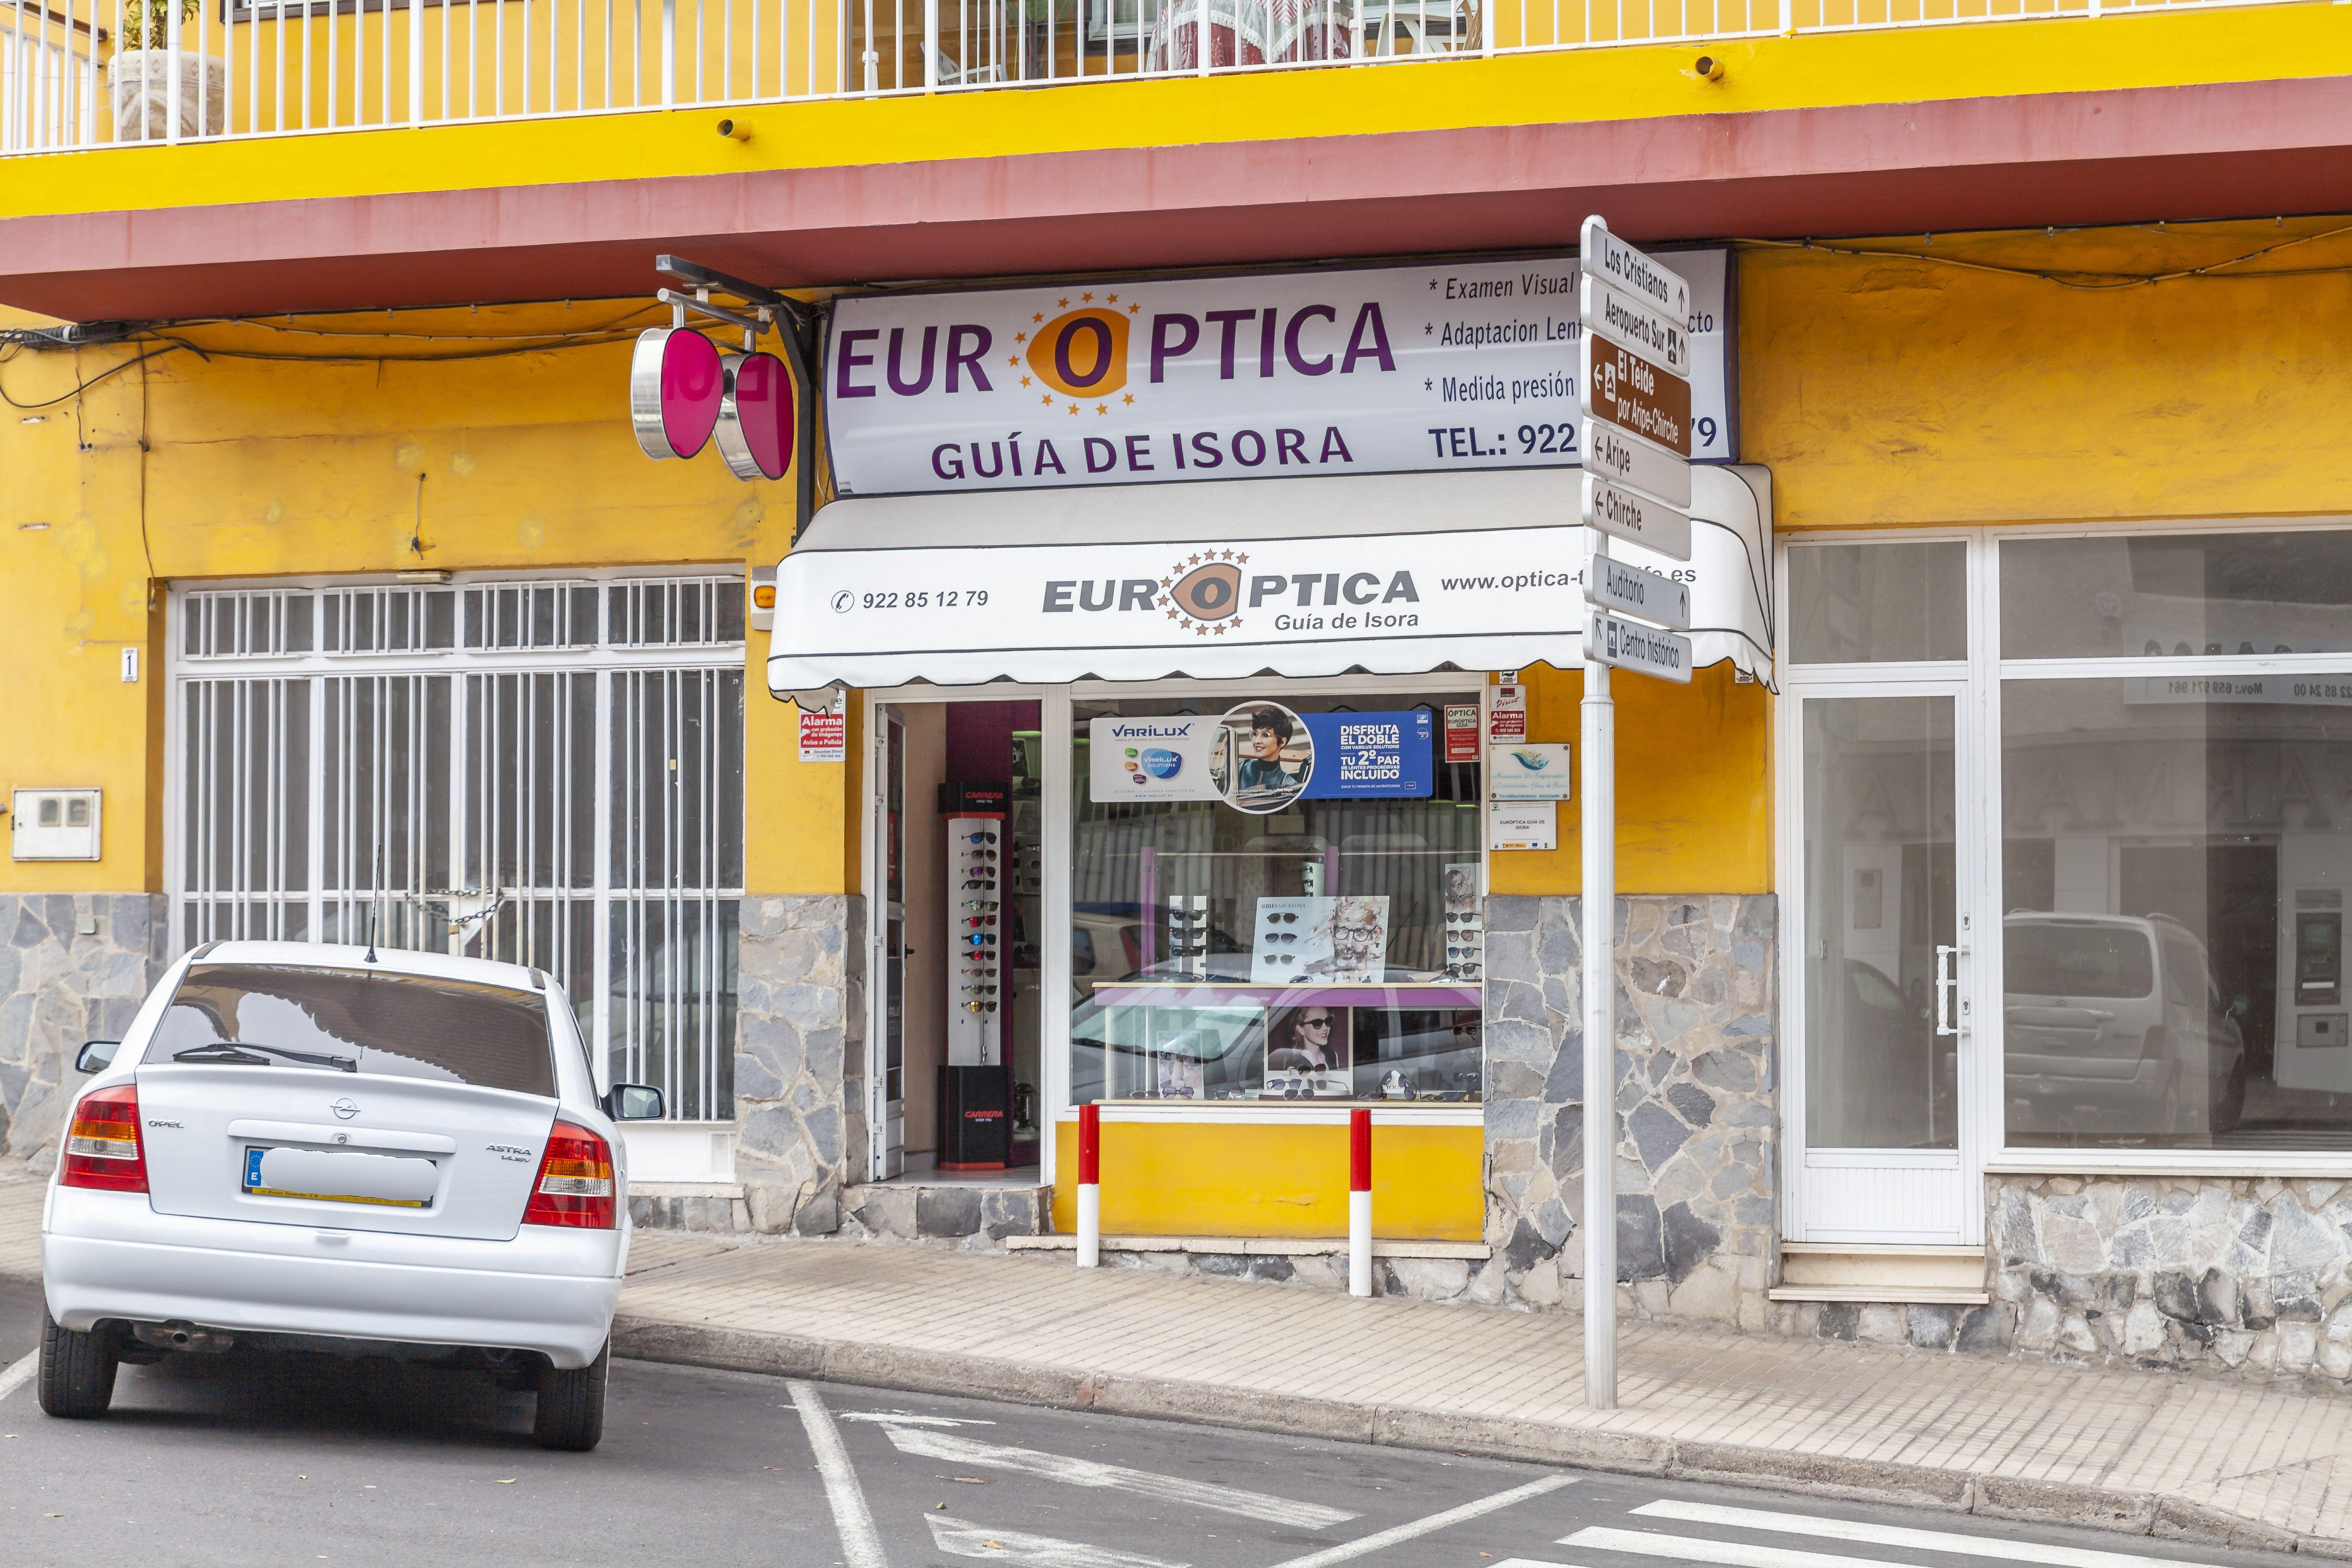 Graduamos gafas deportivas en Guía de Isora Tenerife